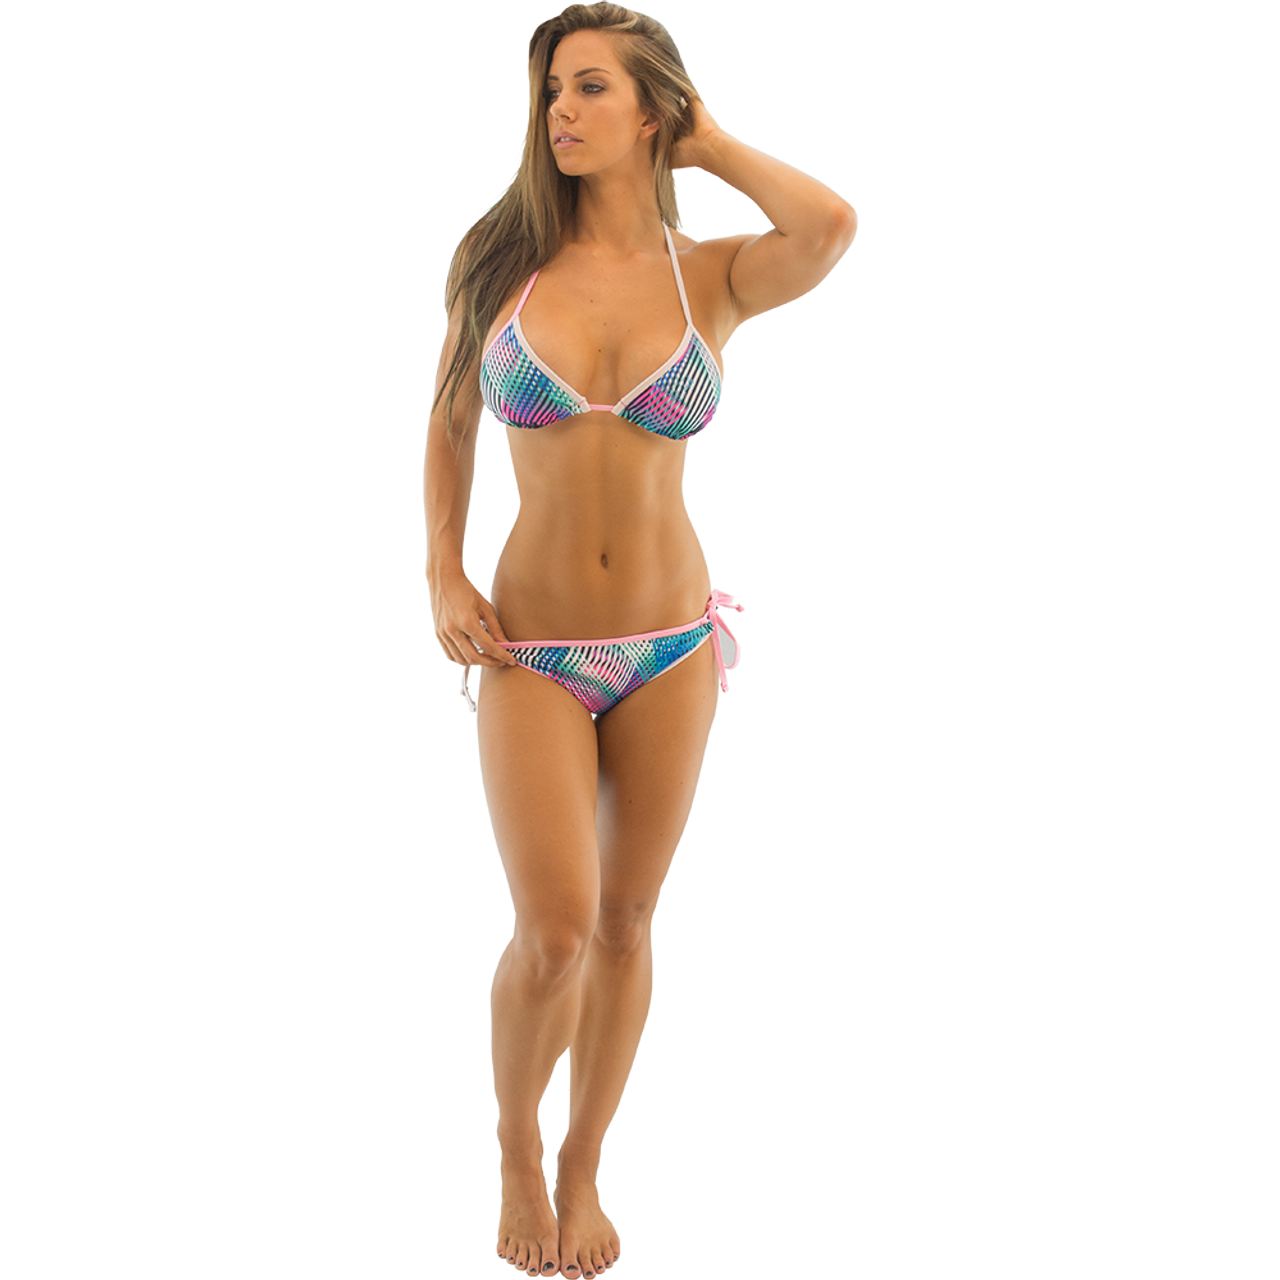 casey newport bikini